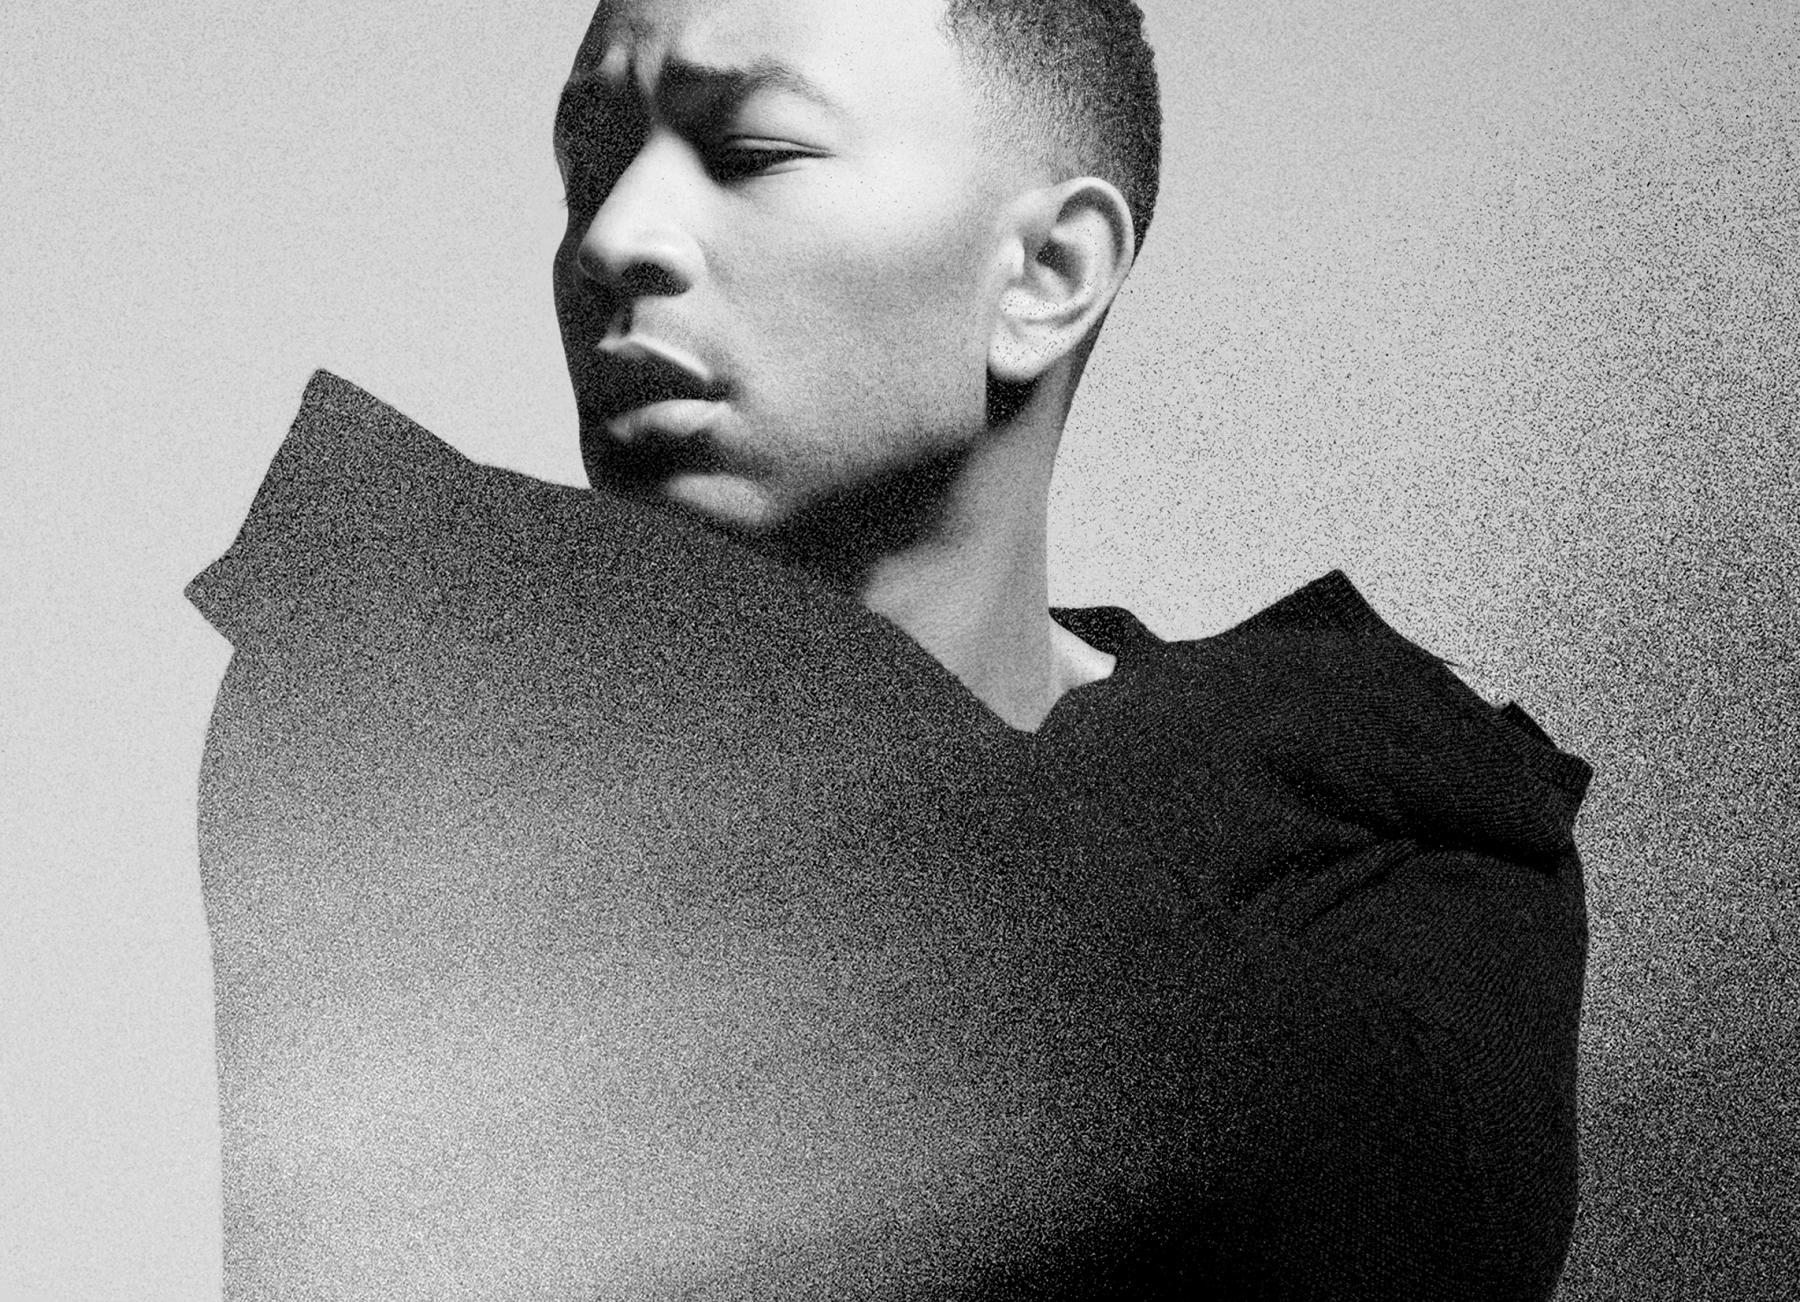 John Legend, Top R&B Artist for Events